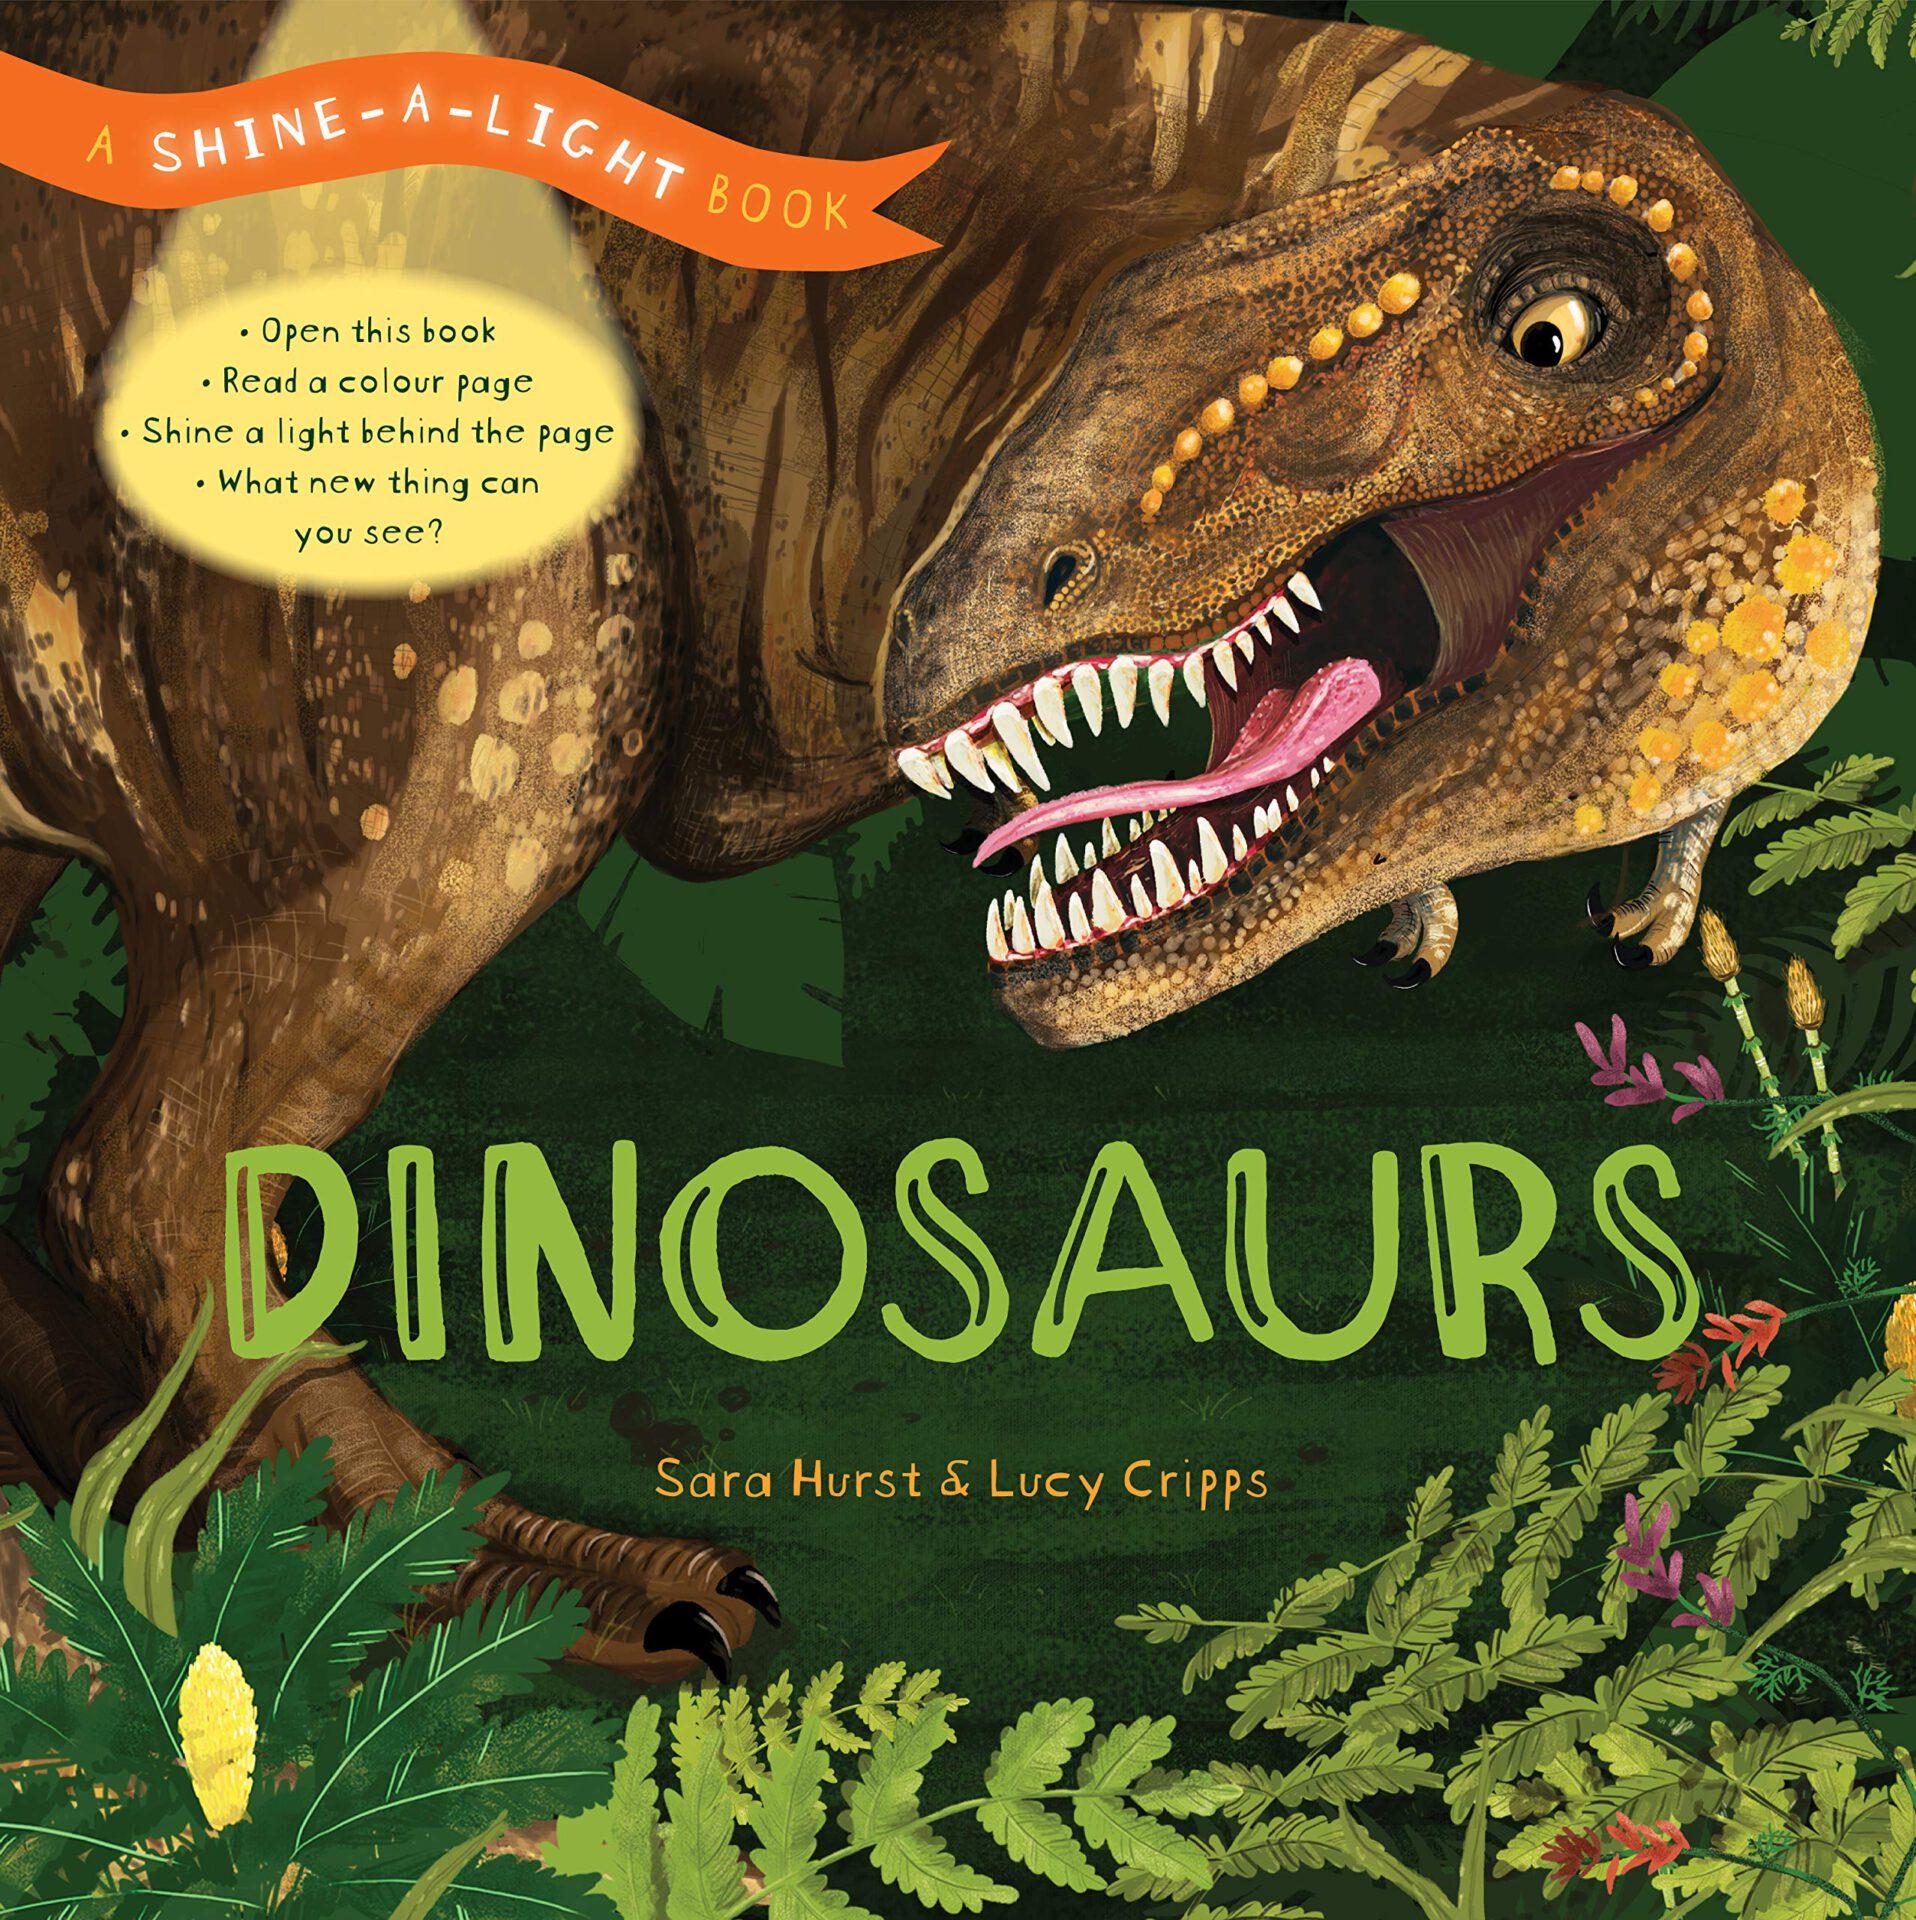 Shine-A-Light: Dinosaurs